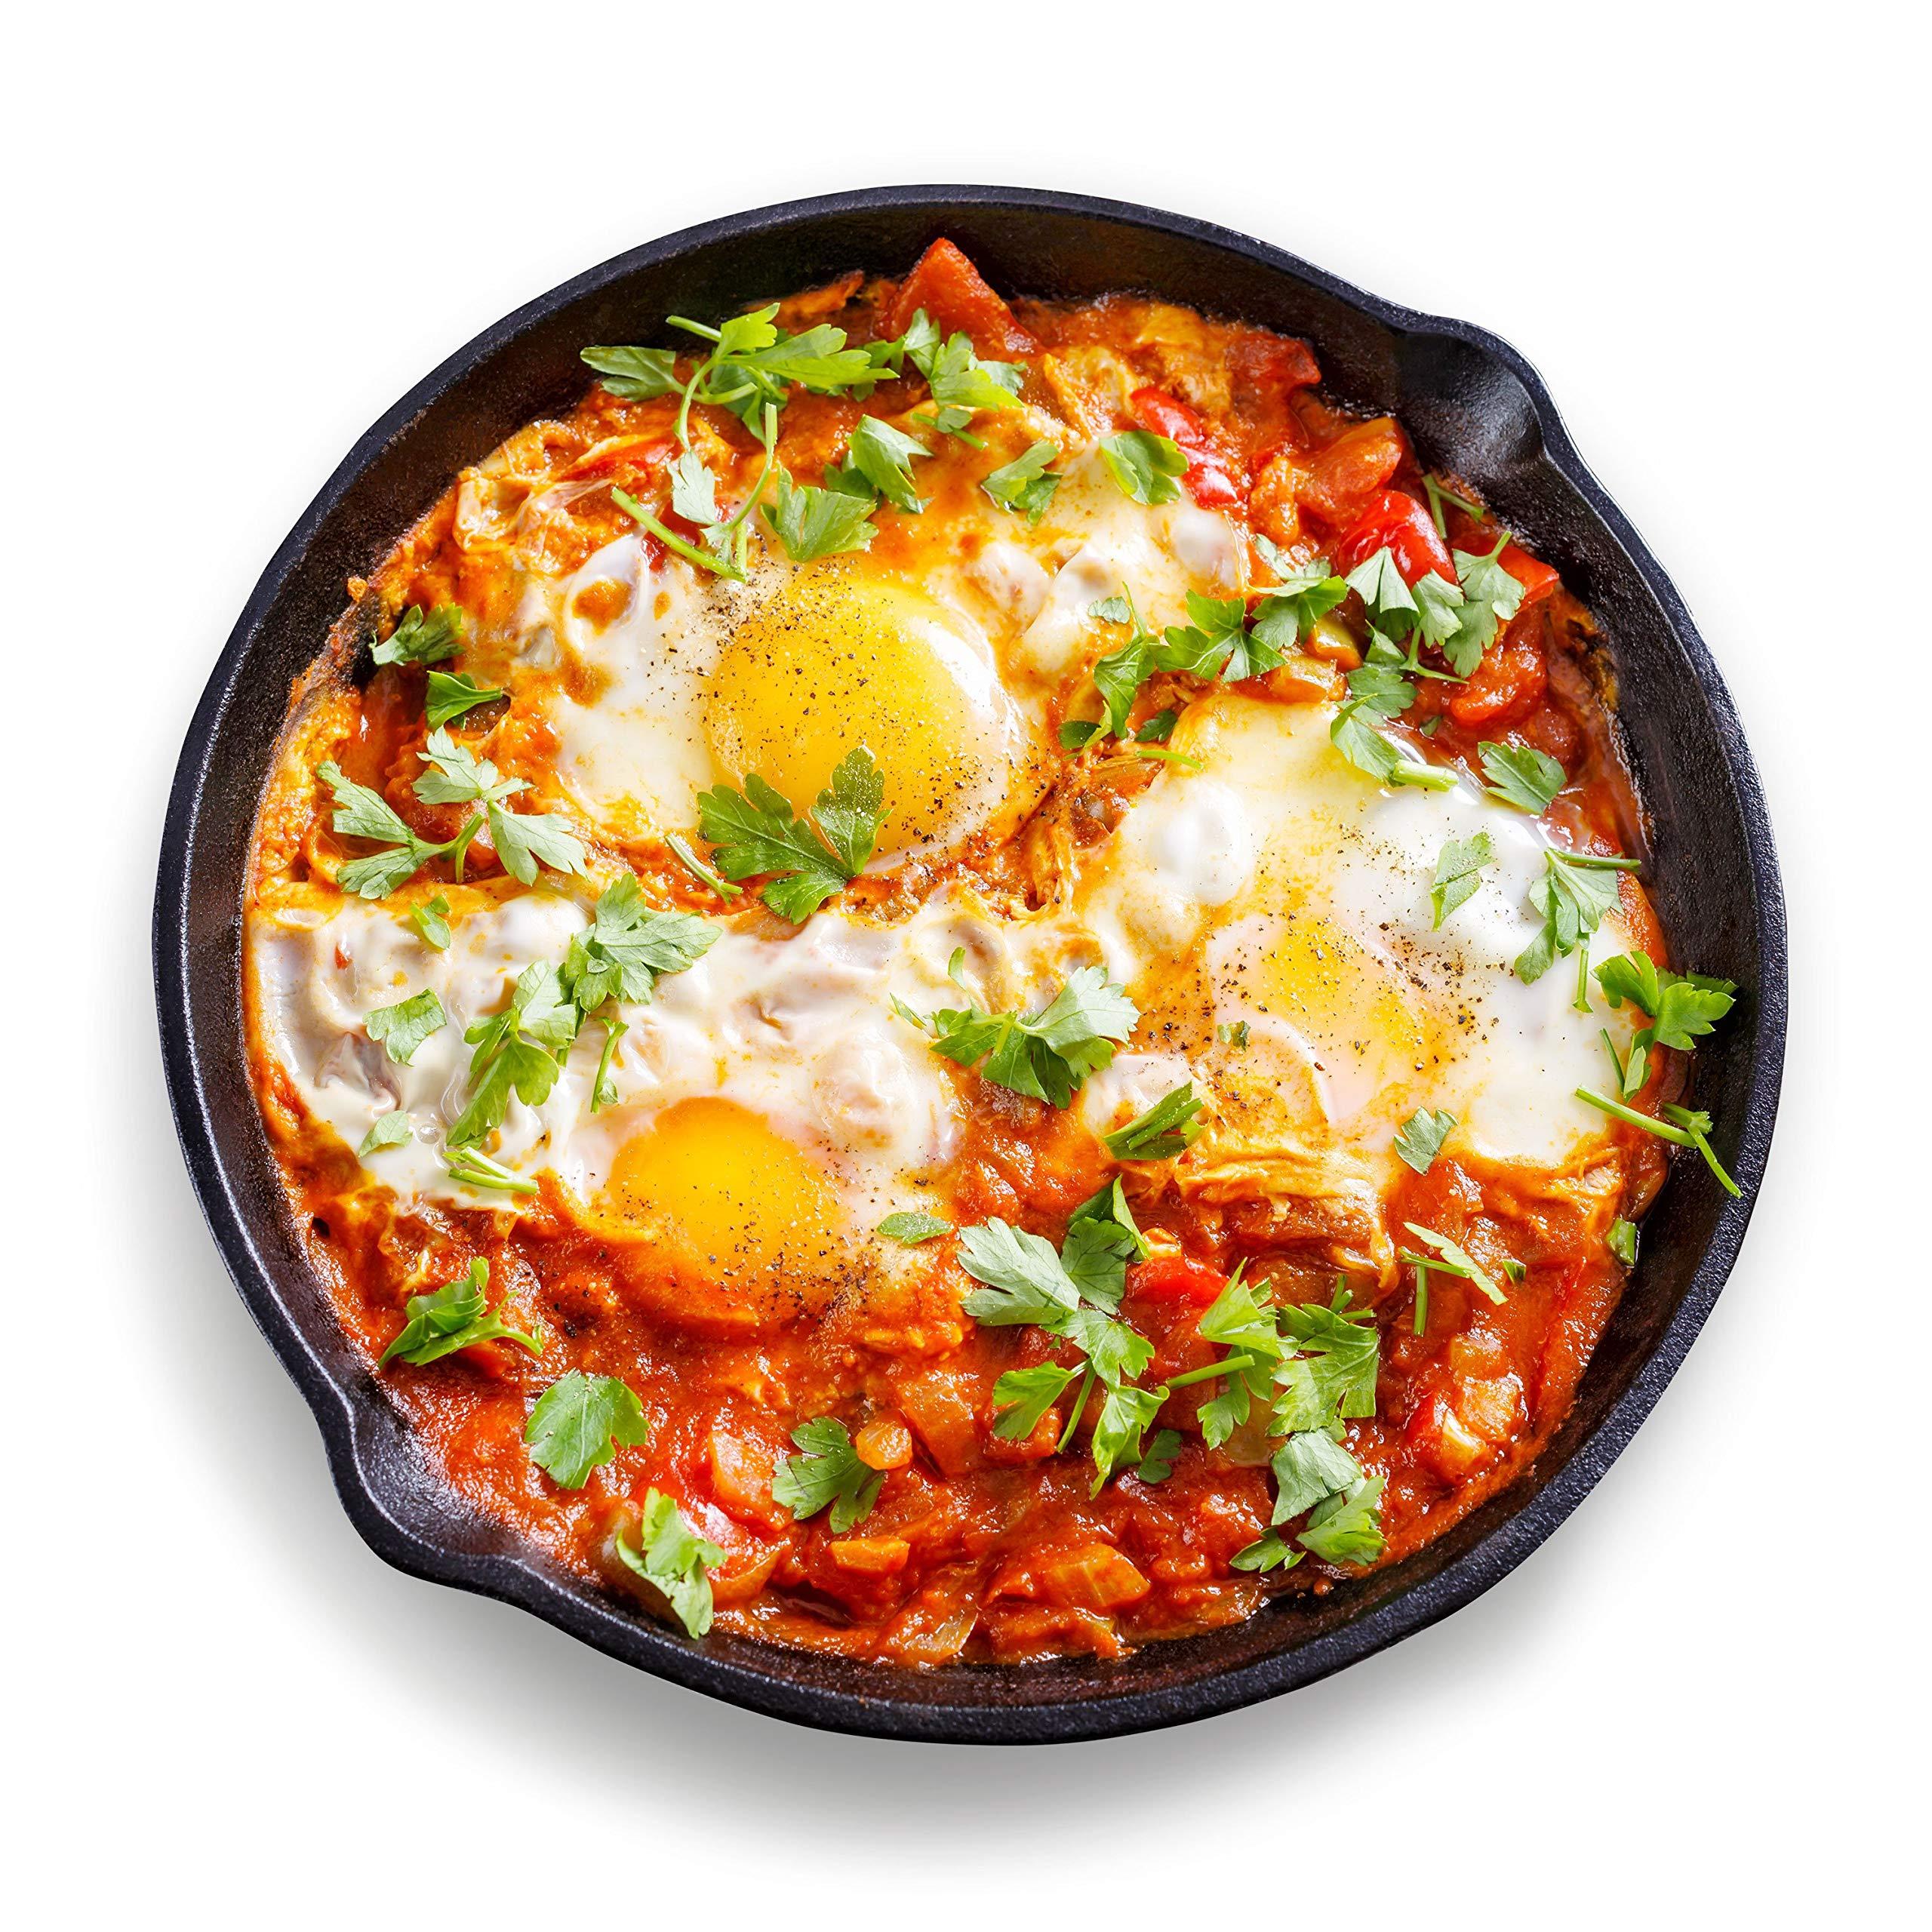 Takeout Kit, Moroccan Shakshuka (Moroccan Baked Eggs) Meal Kit, Serves 4